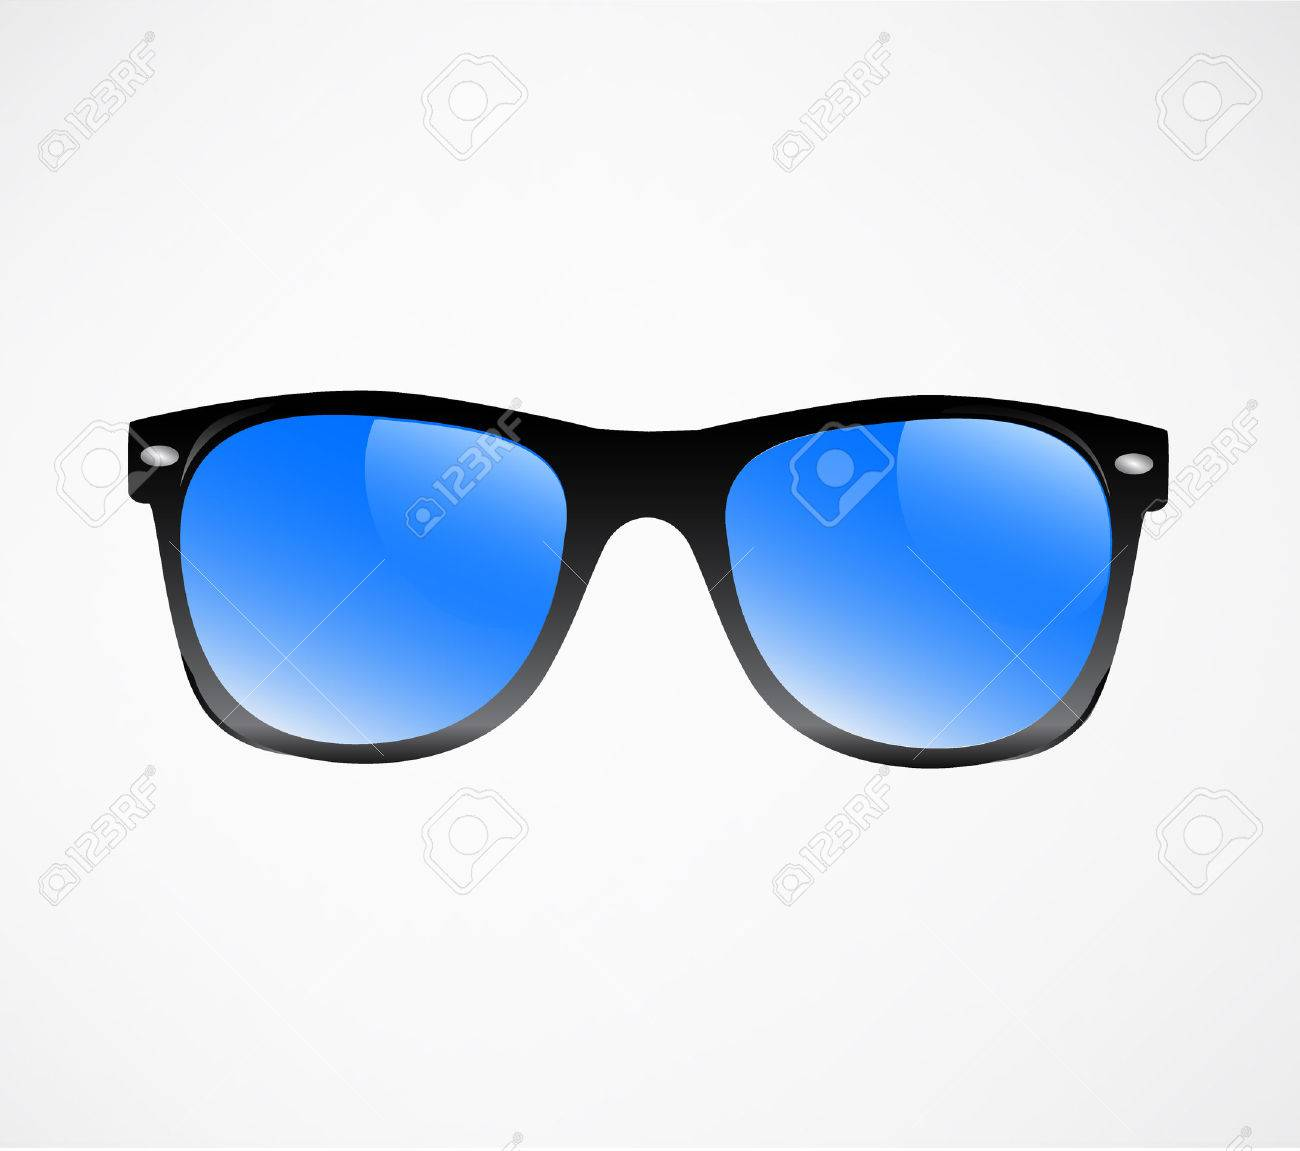 Sunglasses illustration background - 31104844